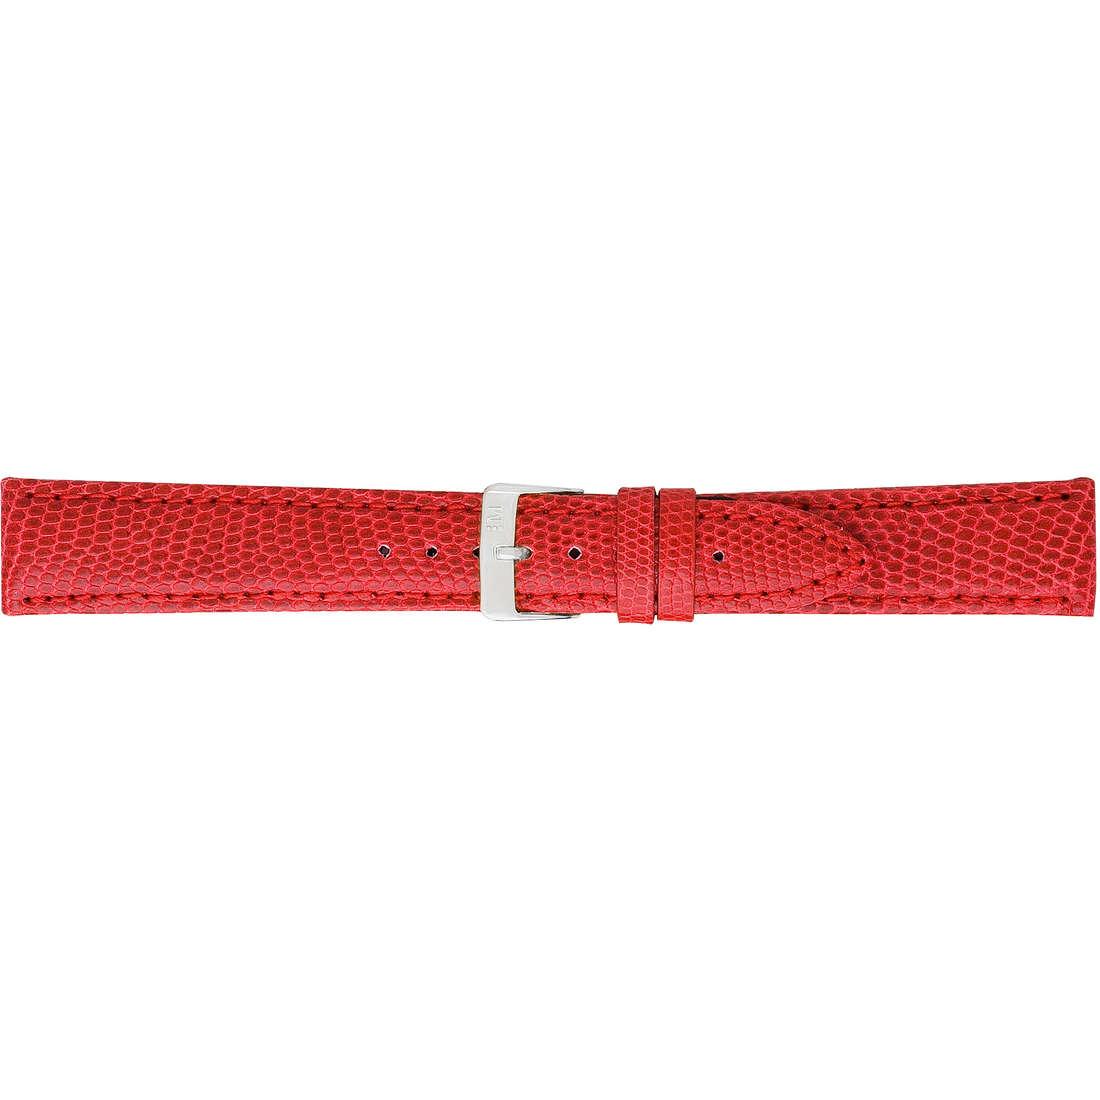 watch watch bands watch straps man Morellato Pelli Preziose A01X2053372083CR16